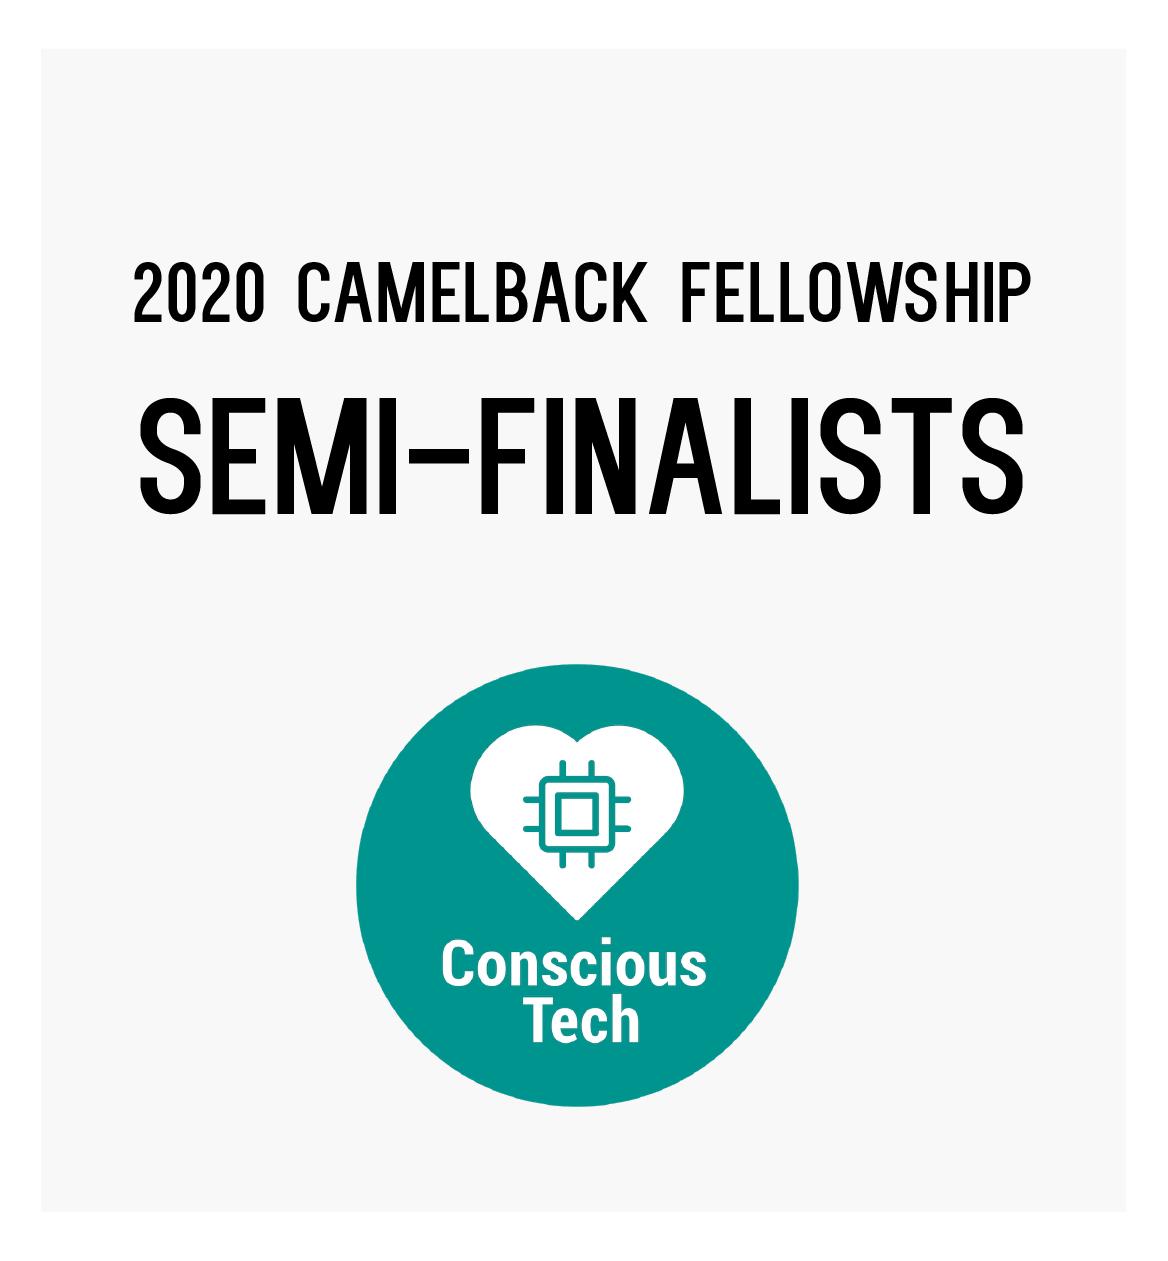 2020selection_box__semifinalist_conscioustech.png